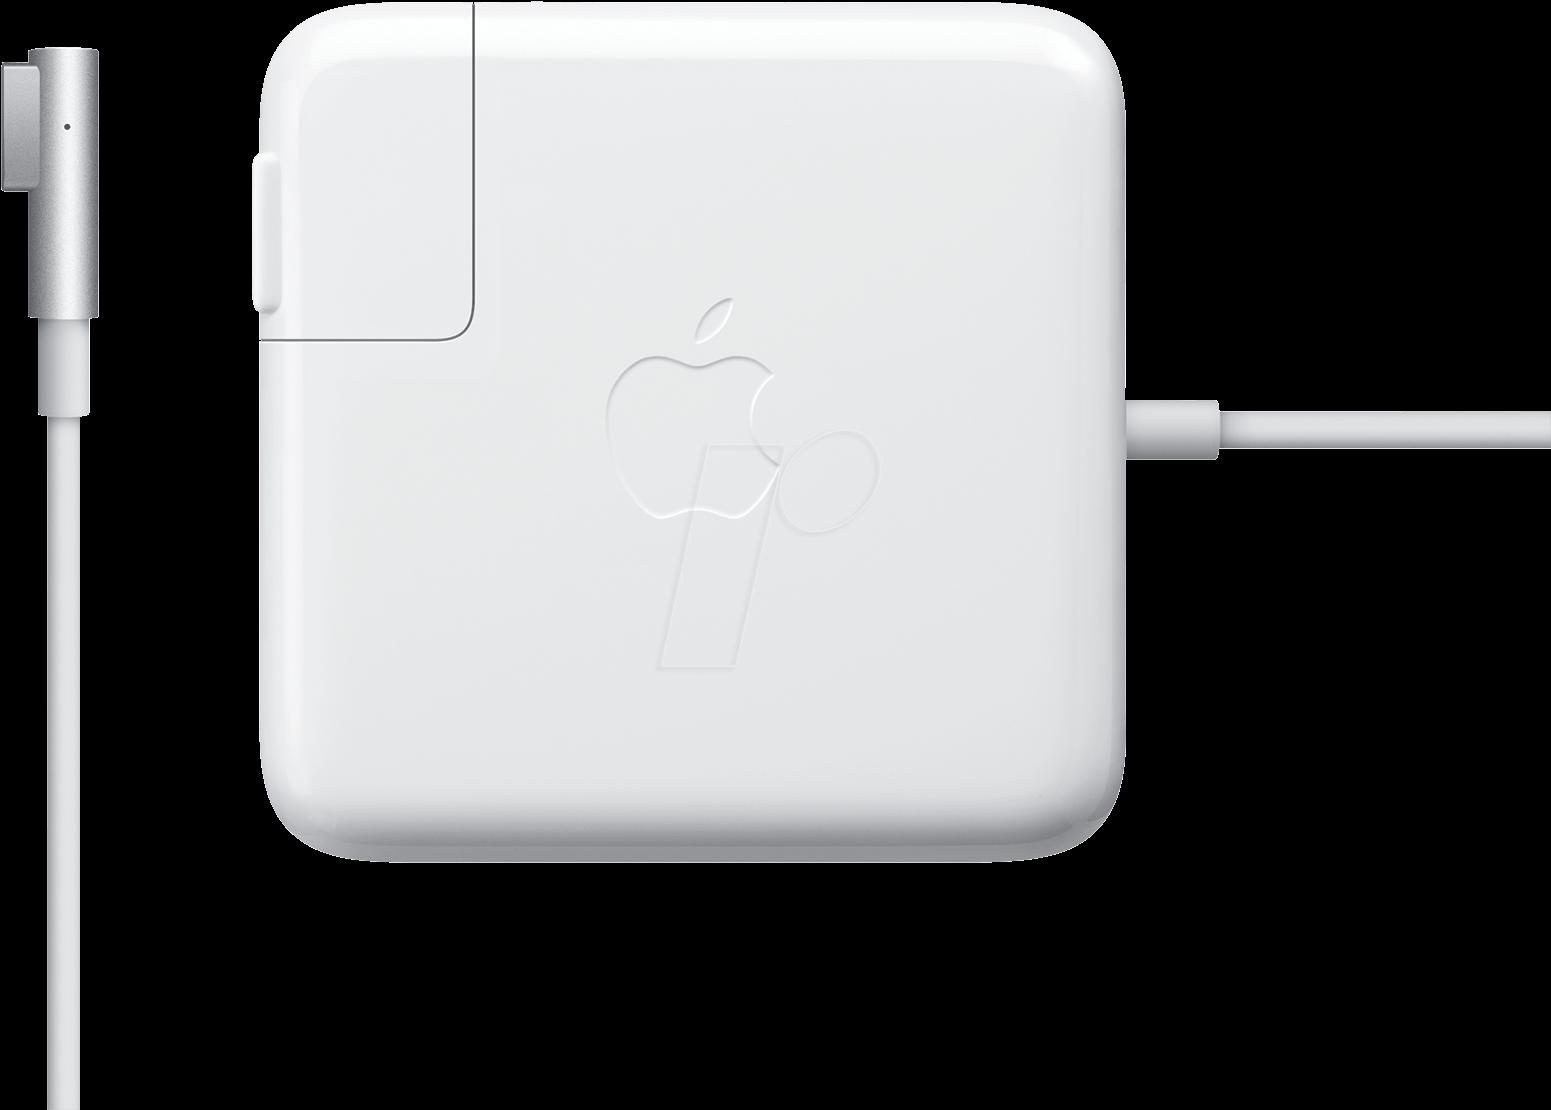 Adapter PNG Transparent Image